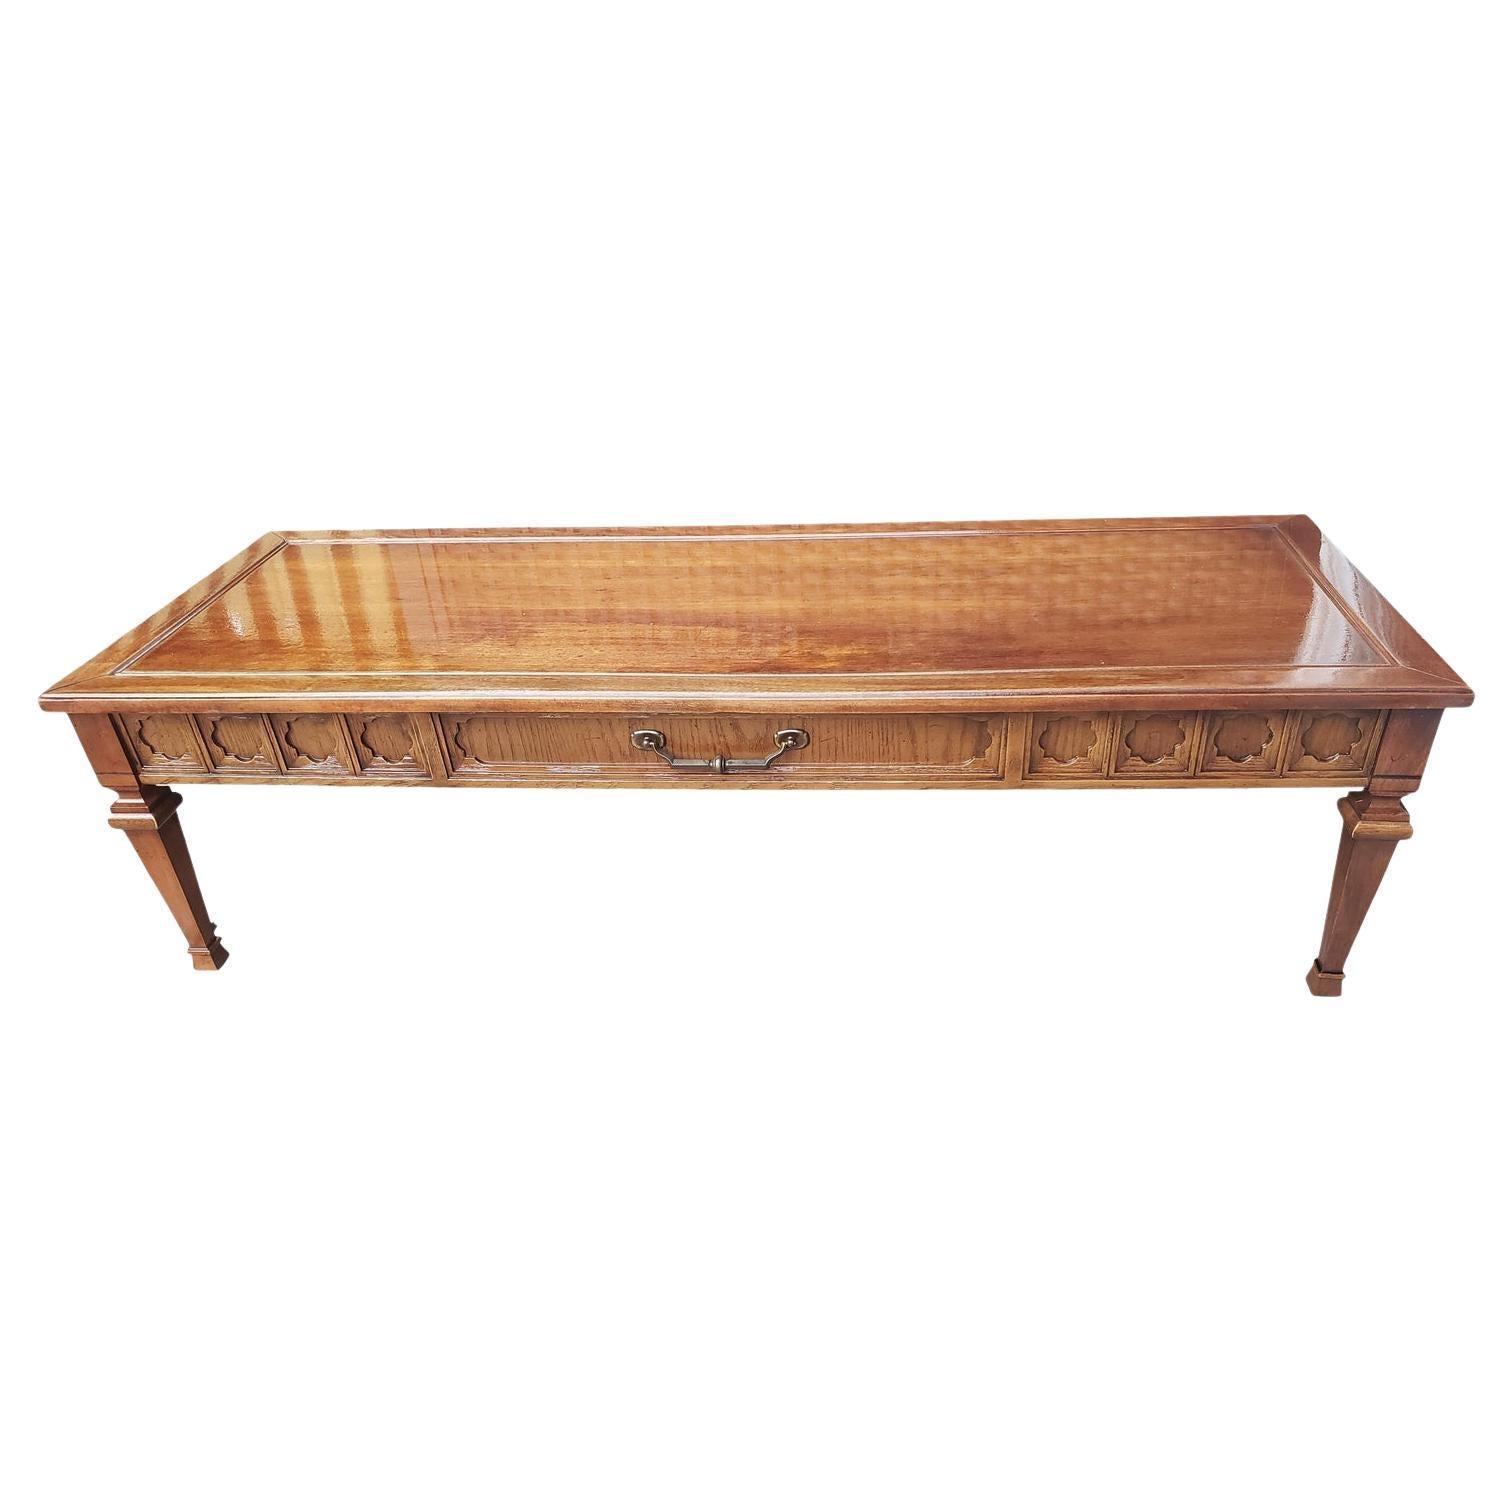 1960s Mid-Century Modern Walnut Coffee Table